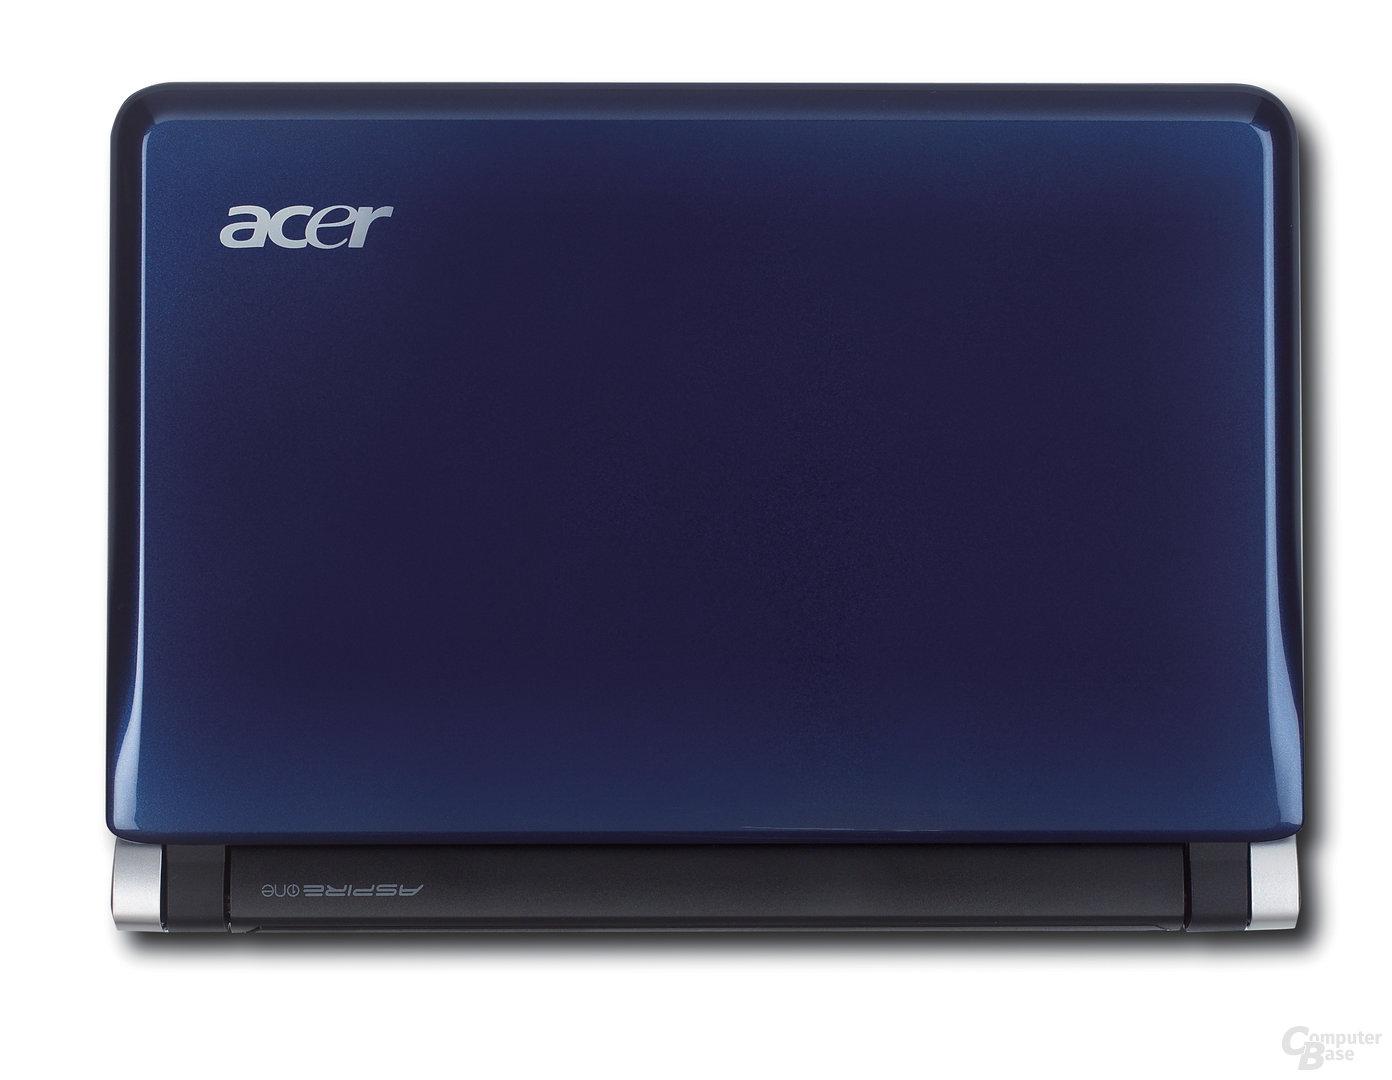 Acer Aspire one D250 in blau